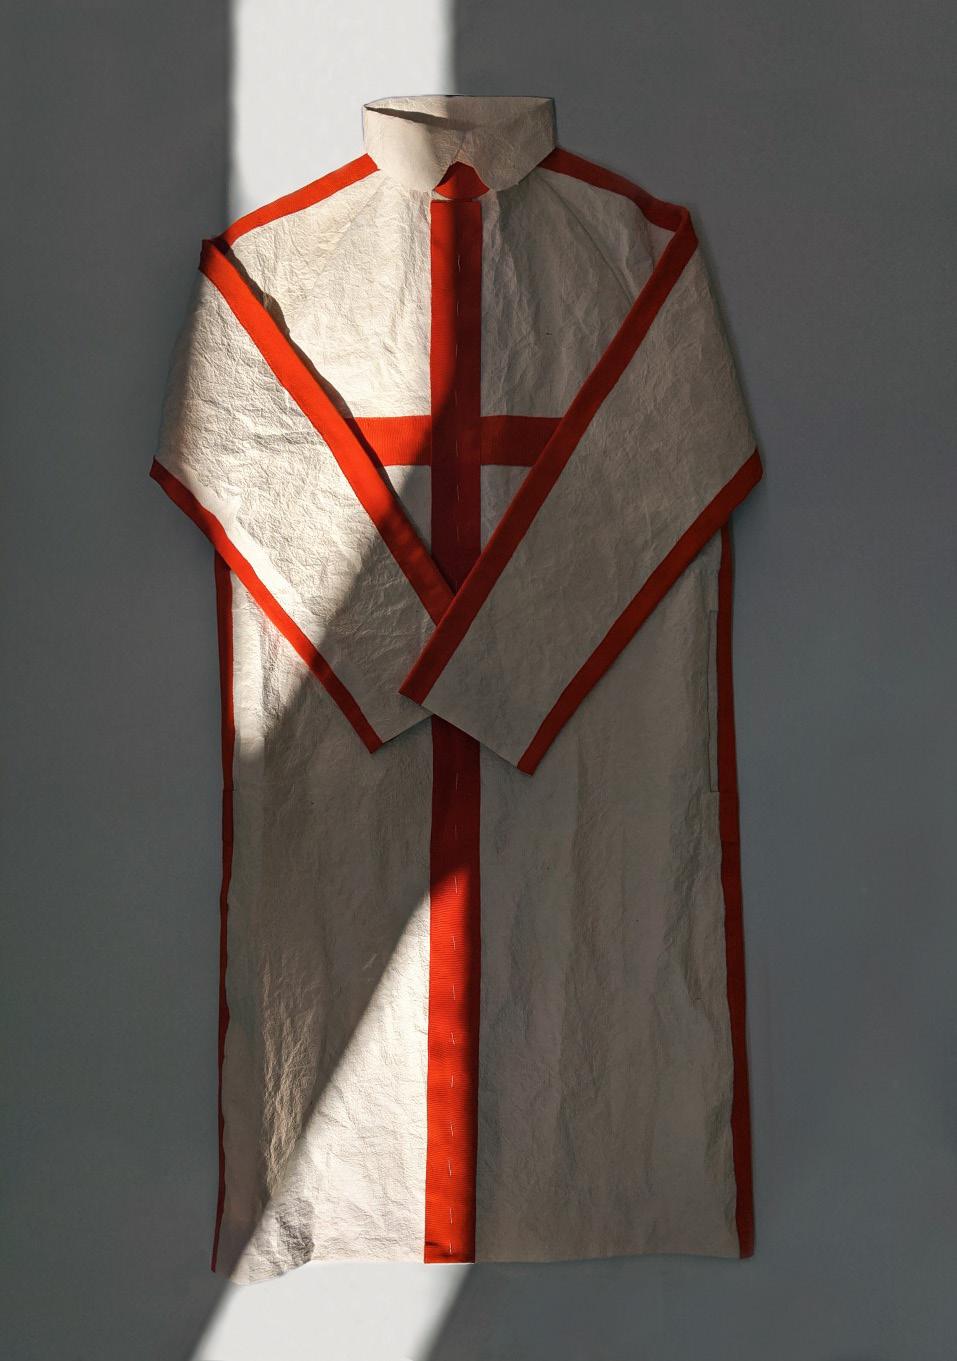 Coat of Theseus